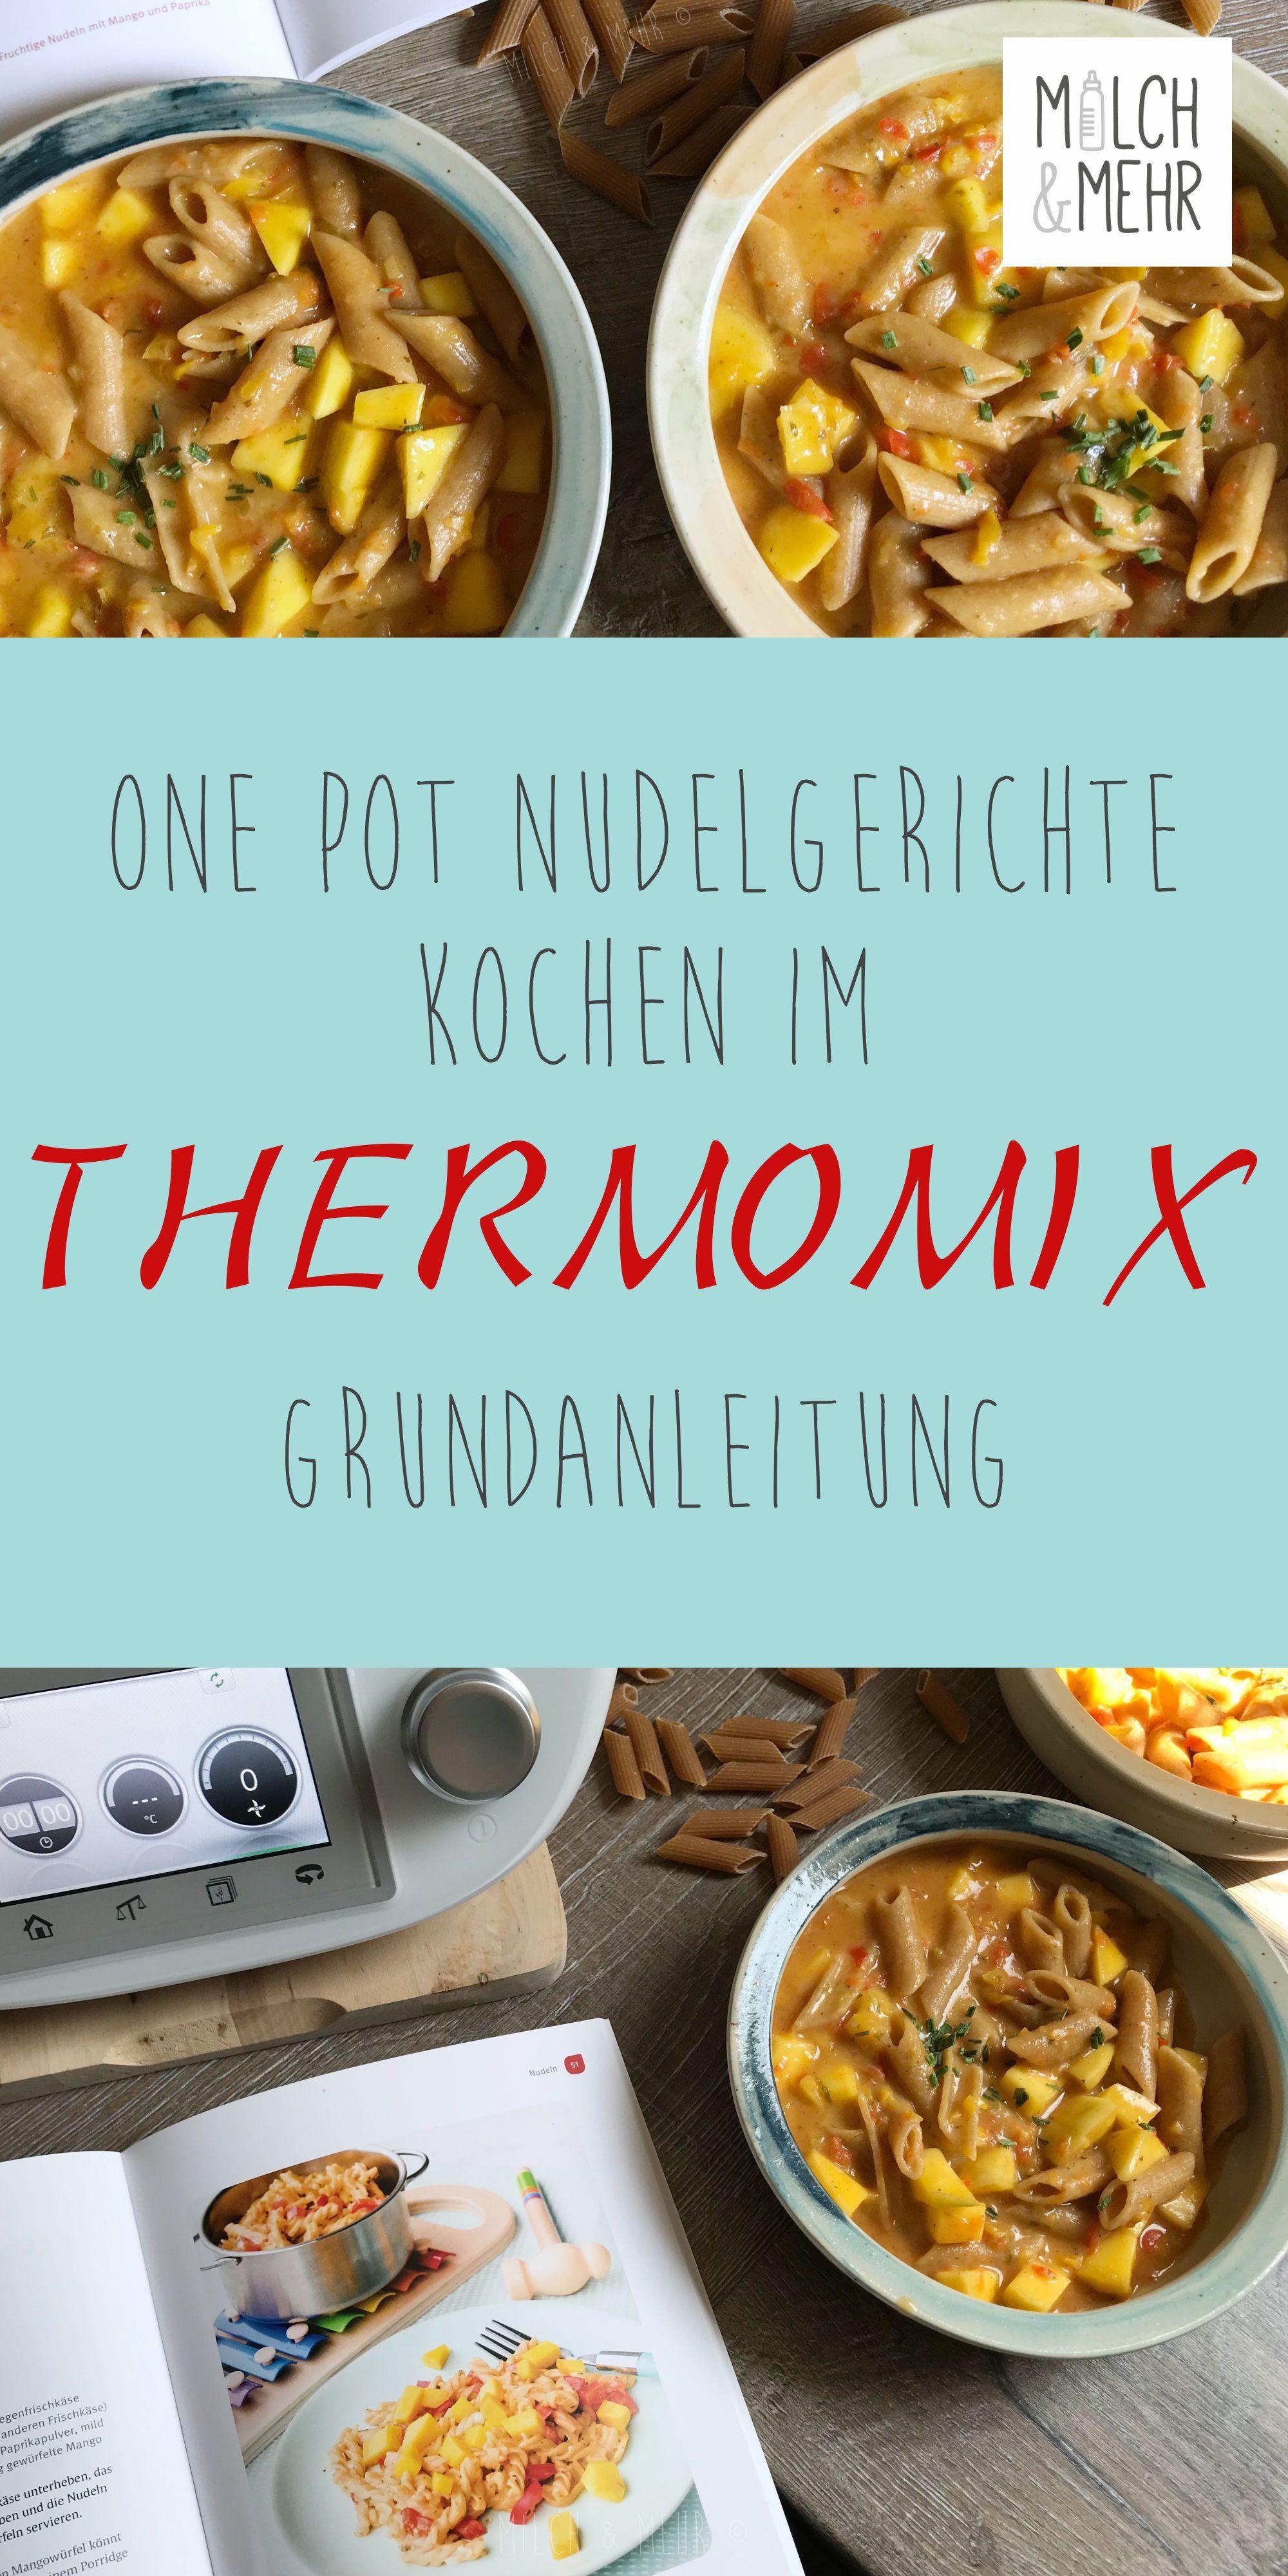 One Pot Pasta mit dem Thermomix #onepotpastarecettes